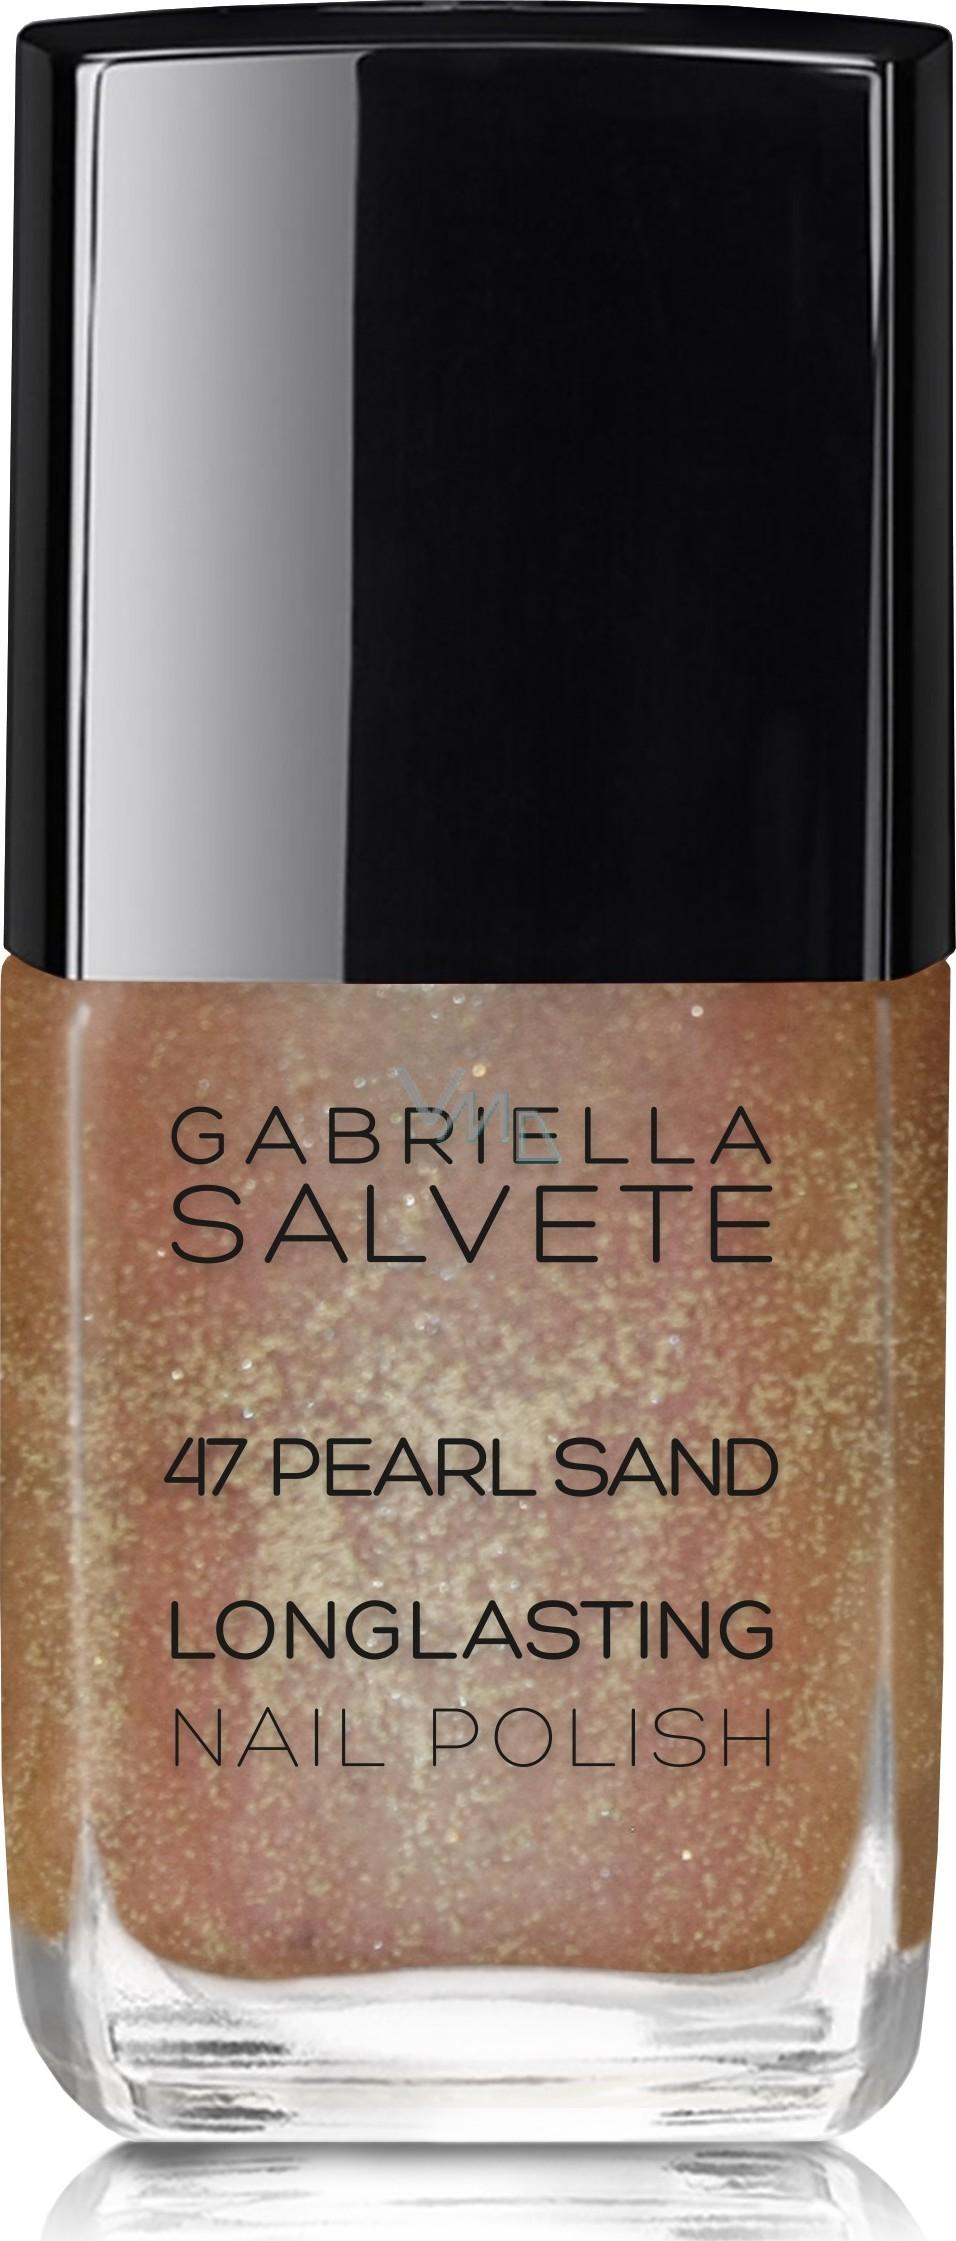 Gabriella Salvete Longlasting Enamel Nail Polish 47 Pearl Sand 11 Ml Vmd Parfumerie Drogerie